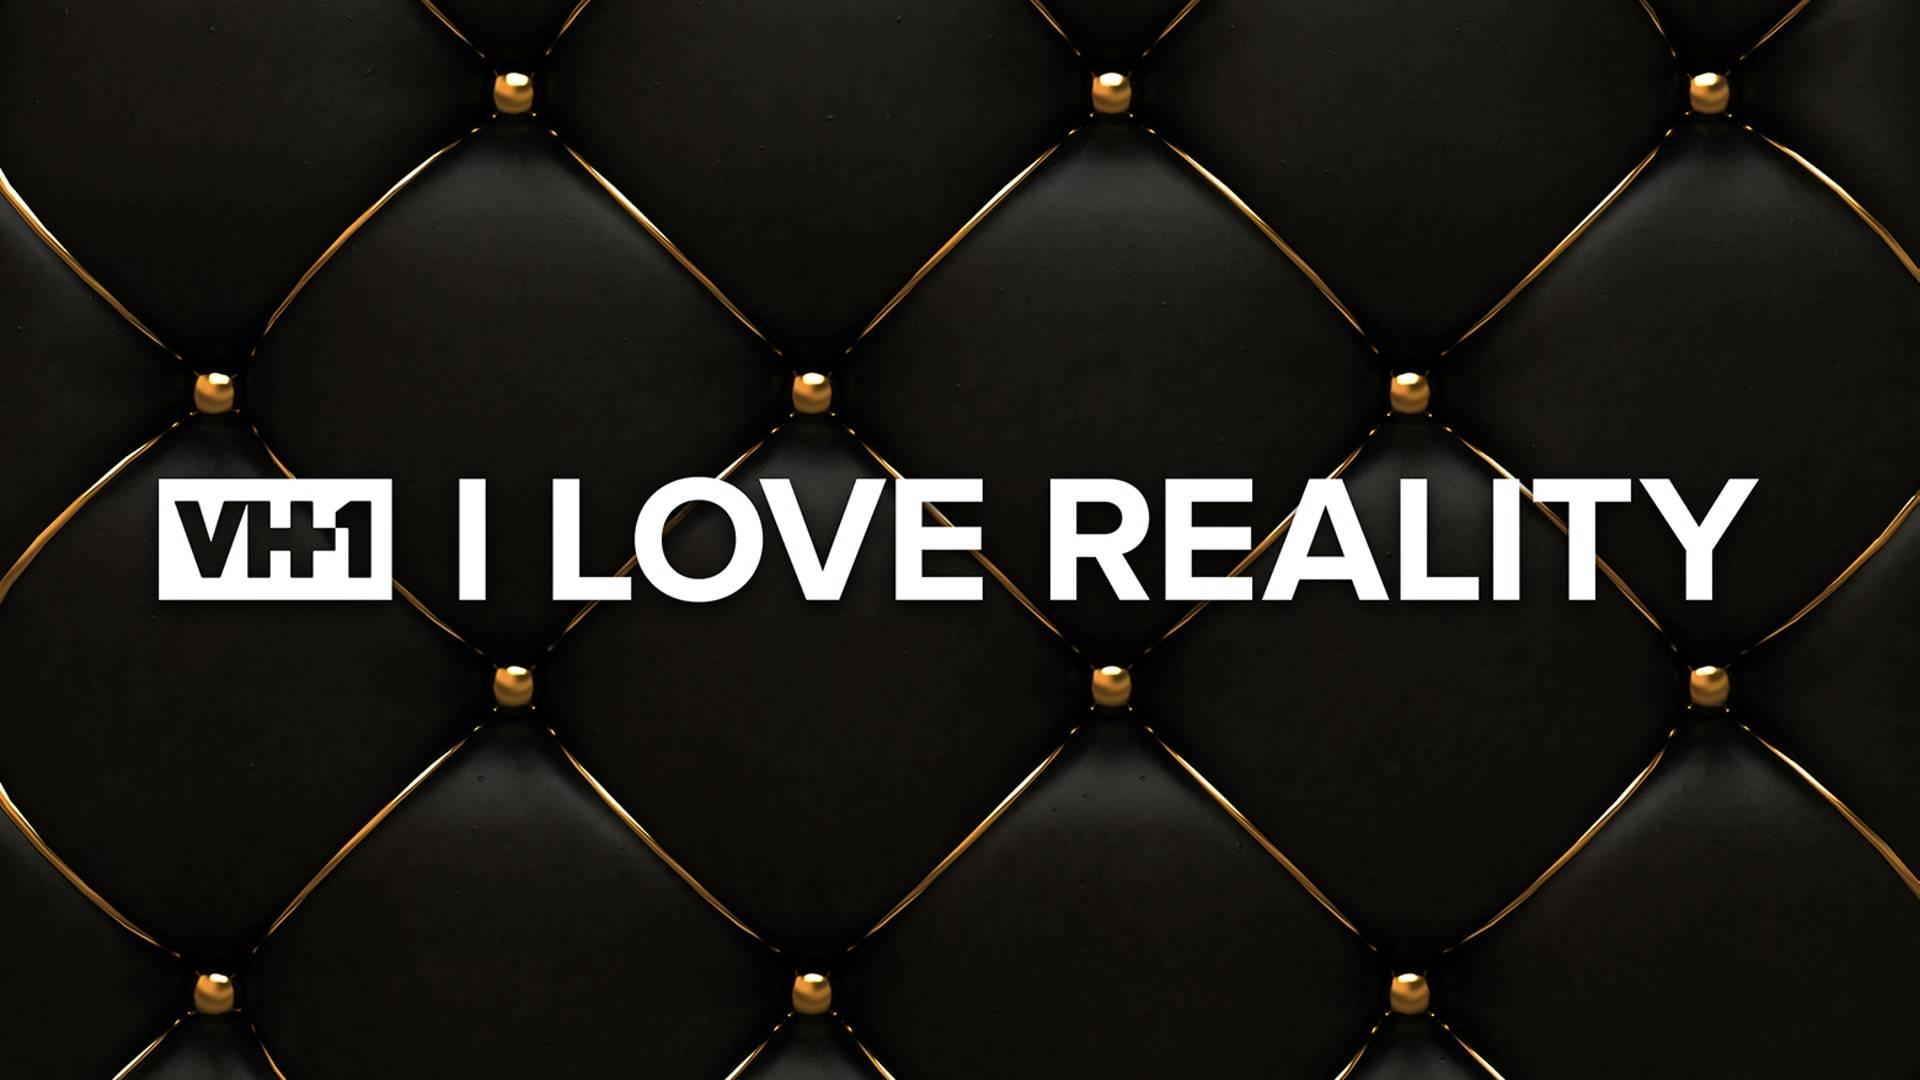 Test Pluto TV 2 - vh1 - love reality